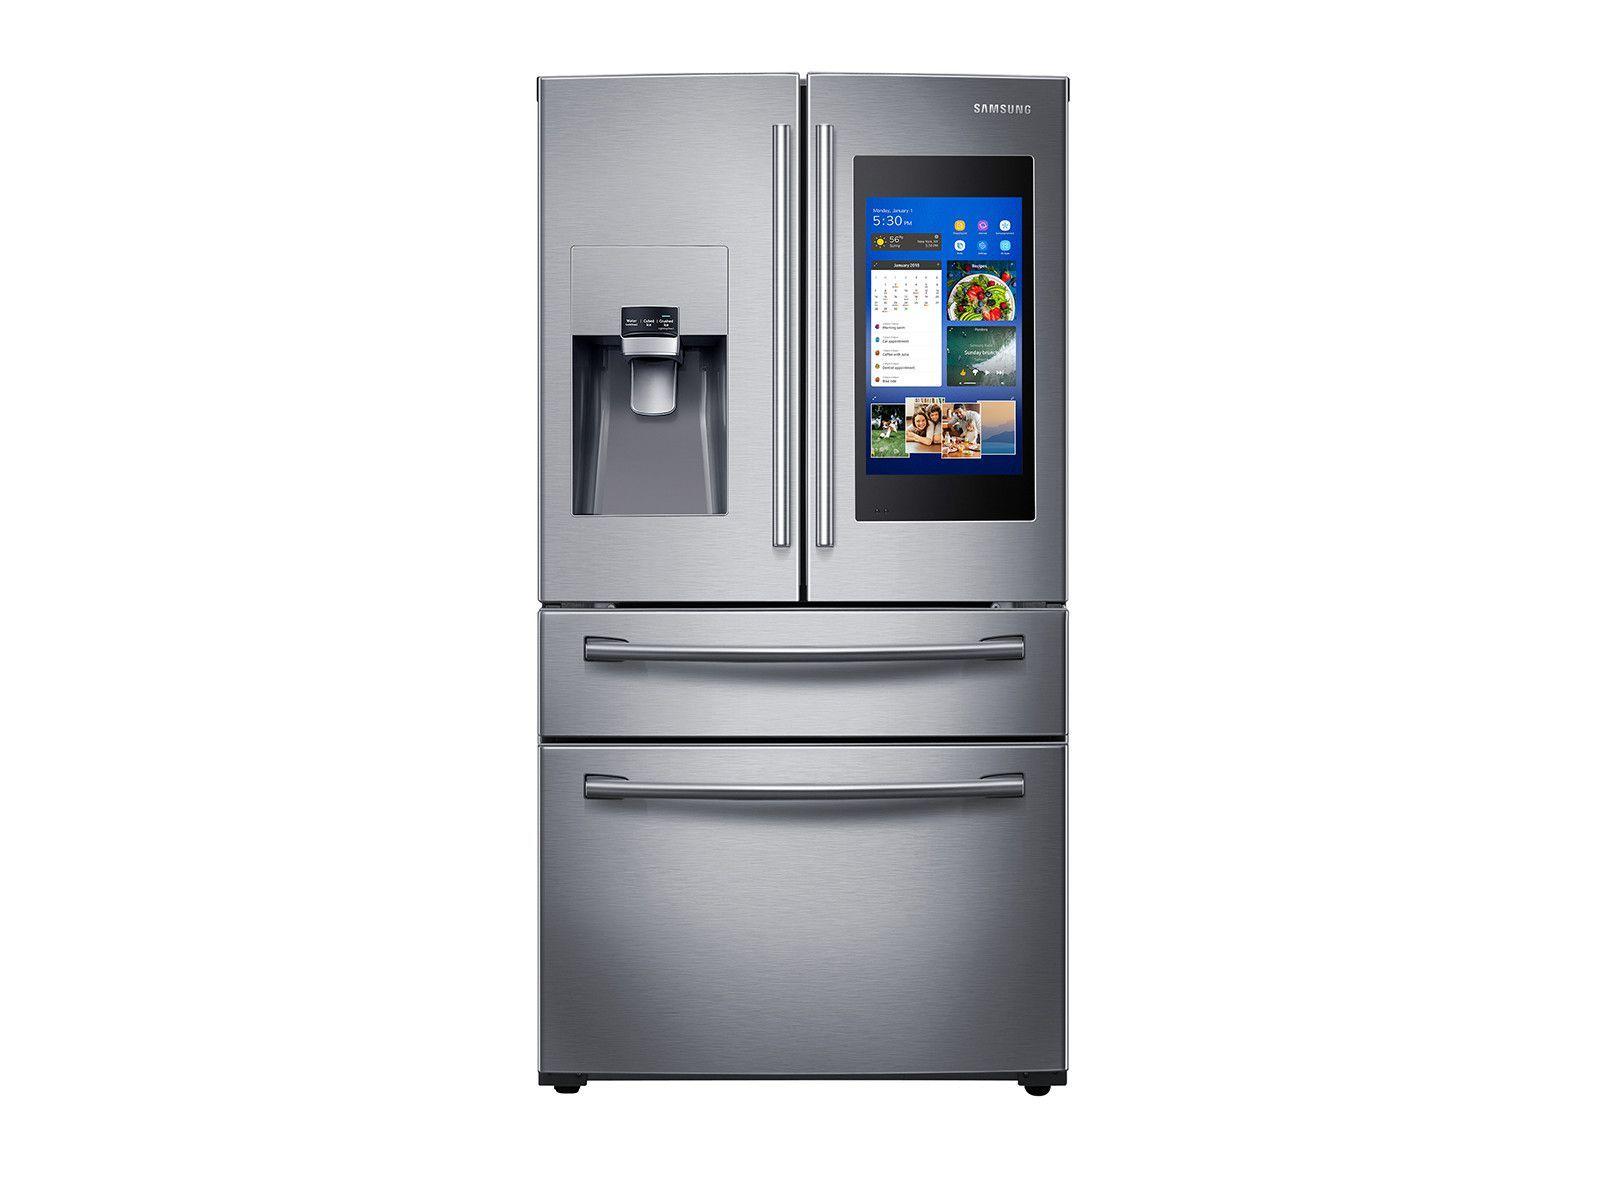 Samsung 4 Door Refrigerator With Family Hub